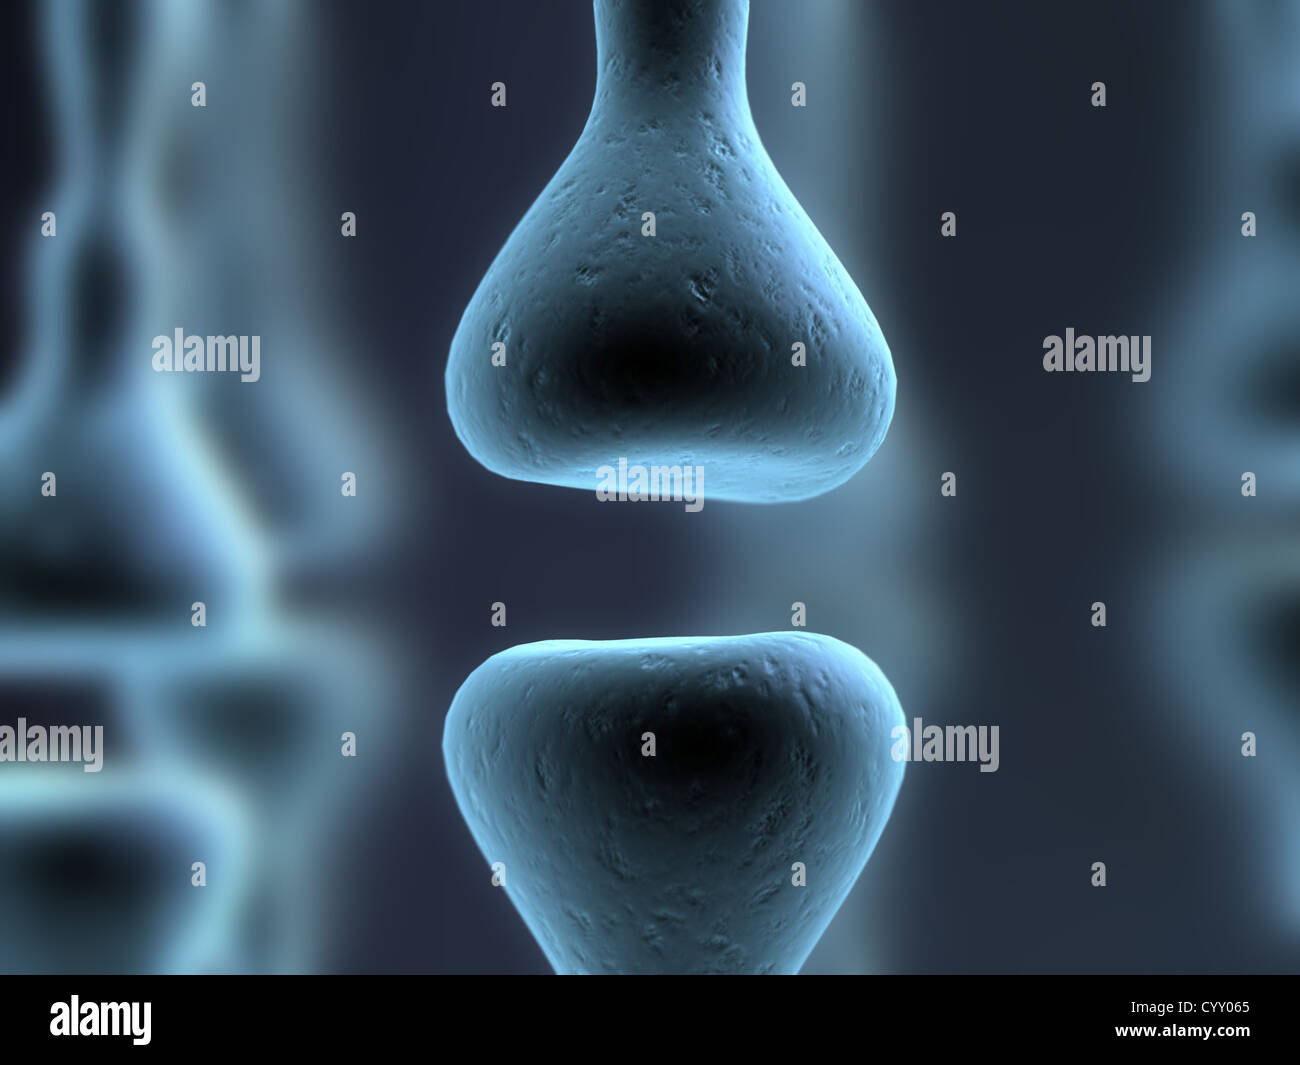 axon, brain, hormon, nerve, neuron, receptor, - Stock Image